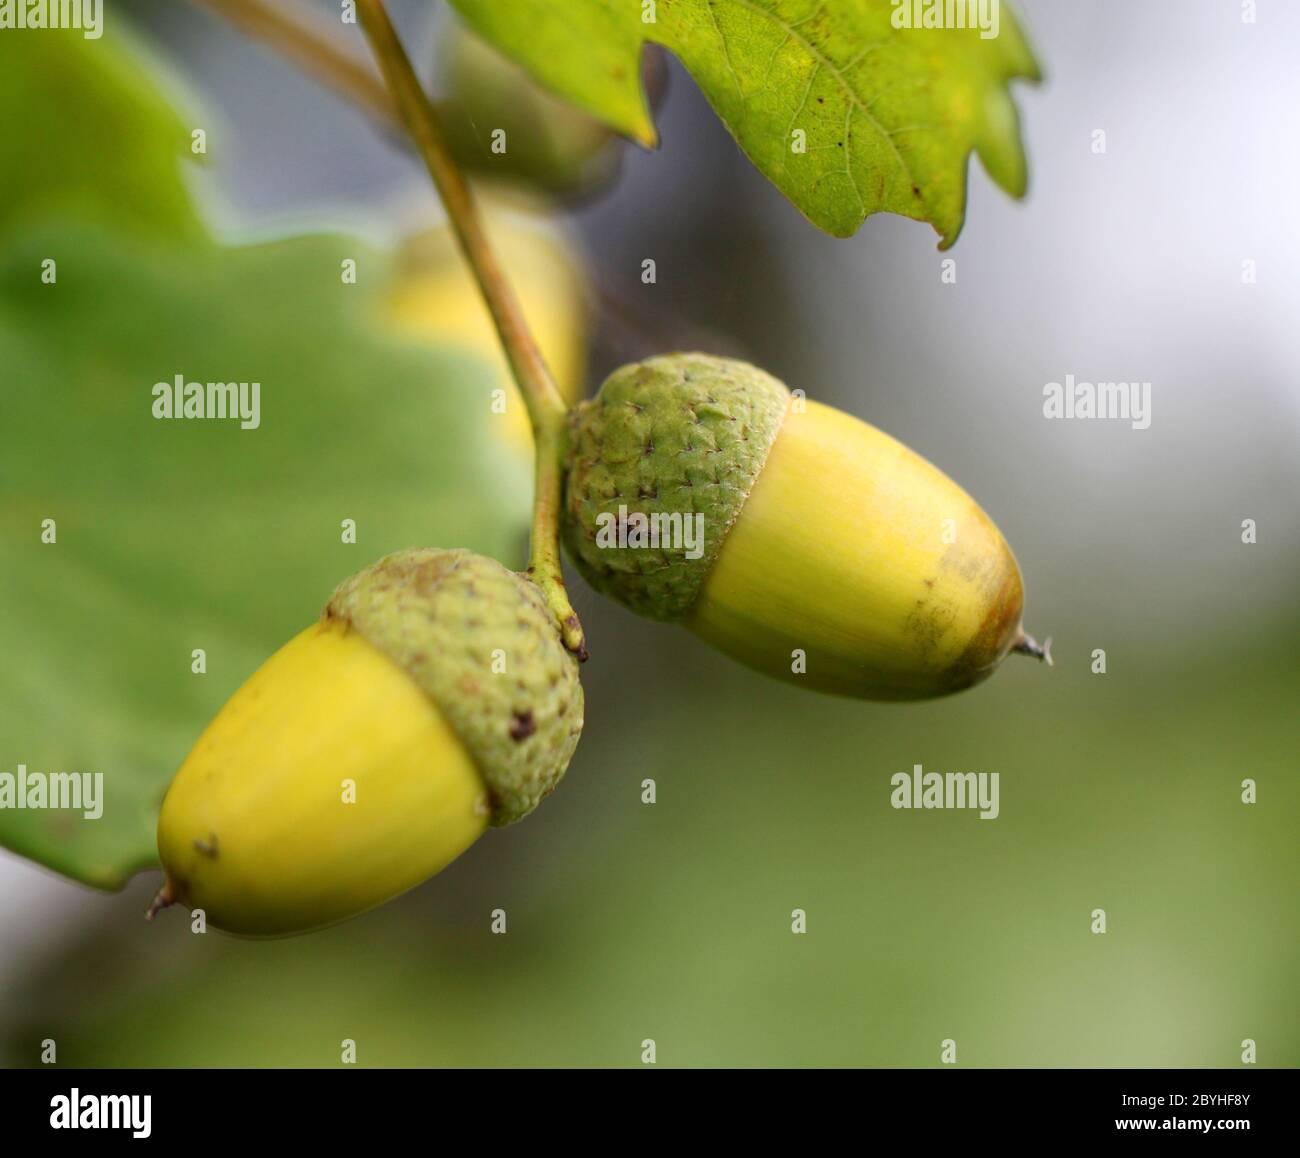 Bellotas verdes en las ramas de robles Foto de stock